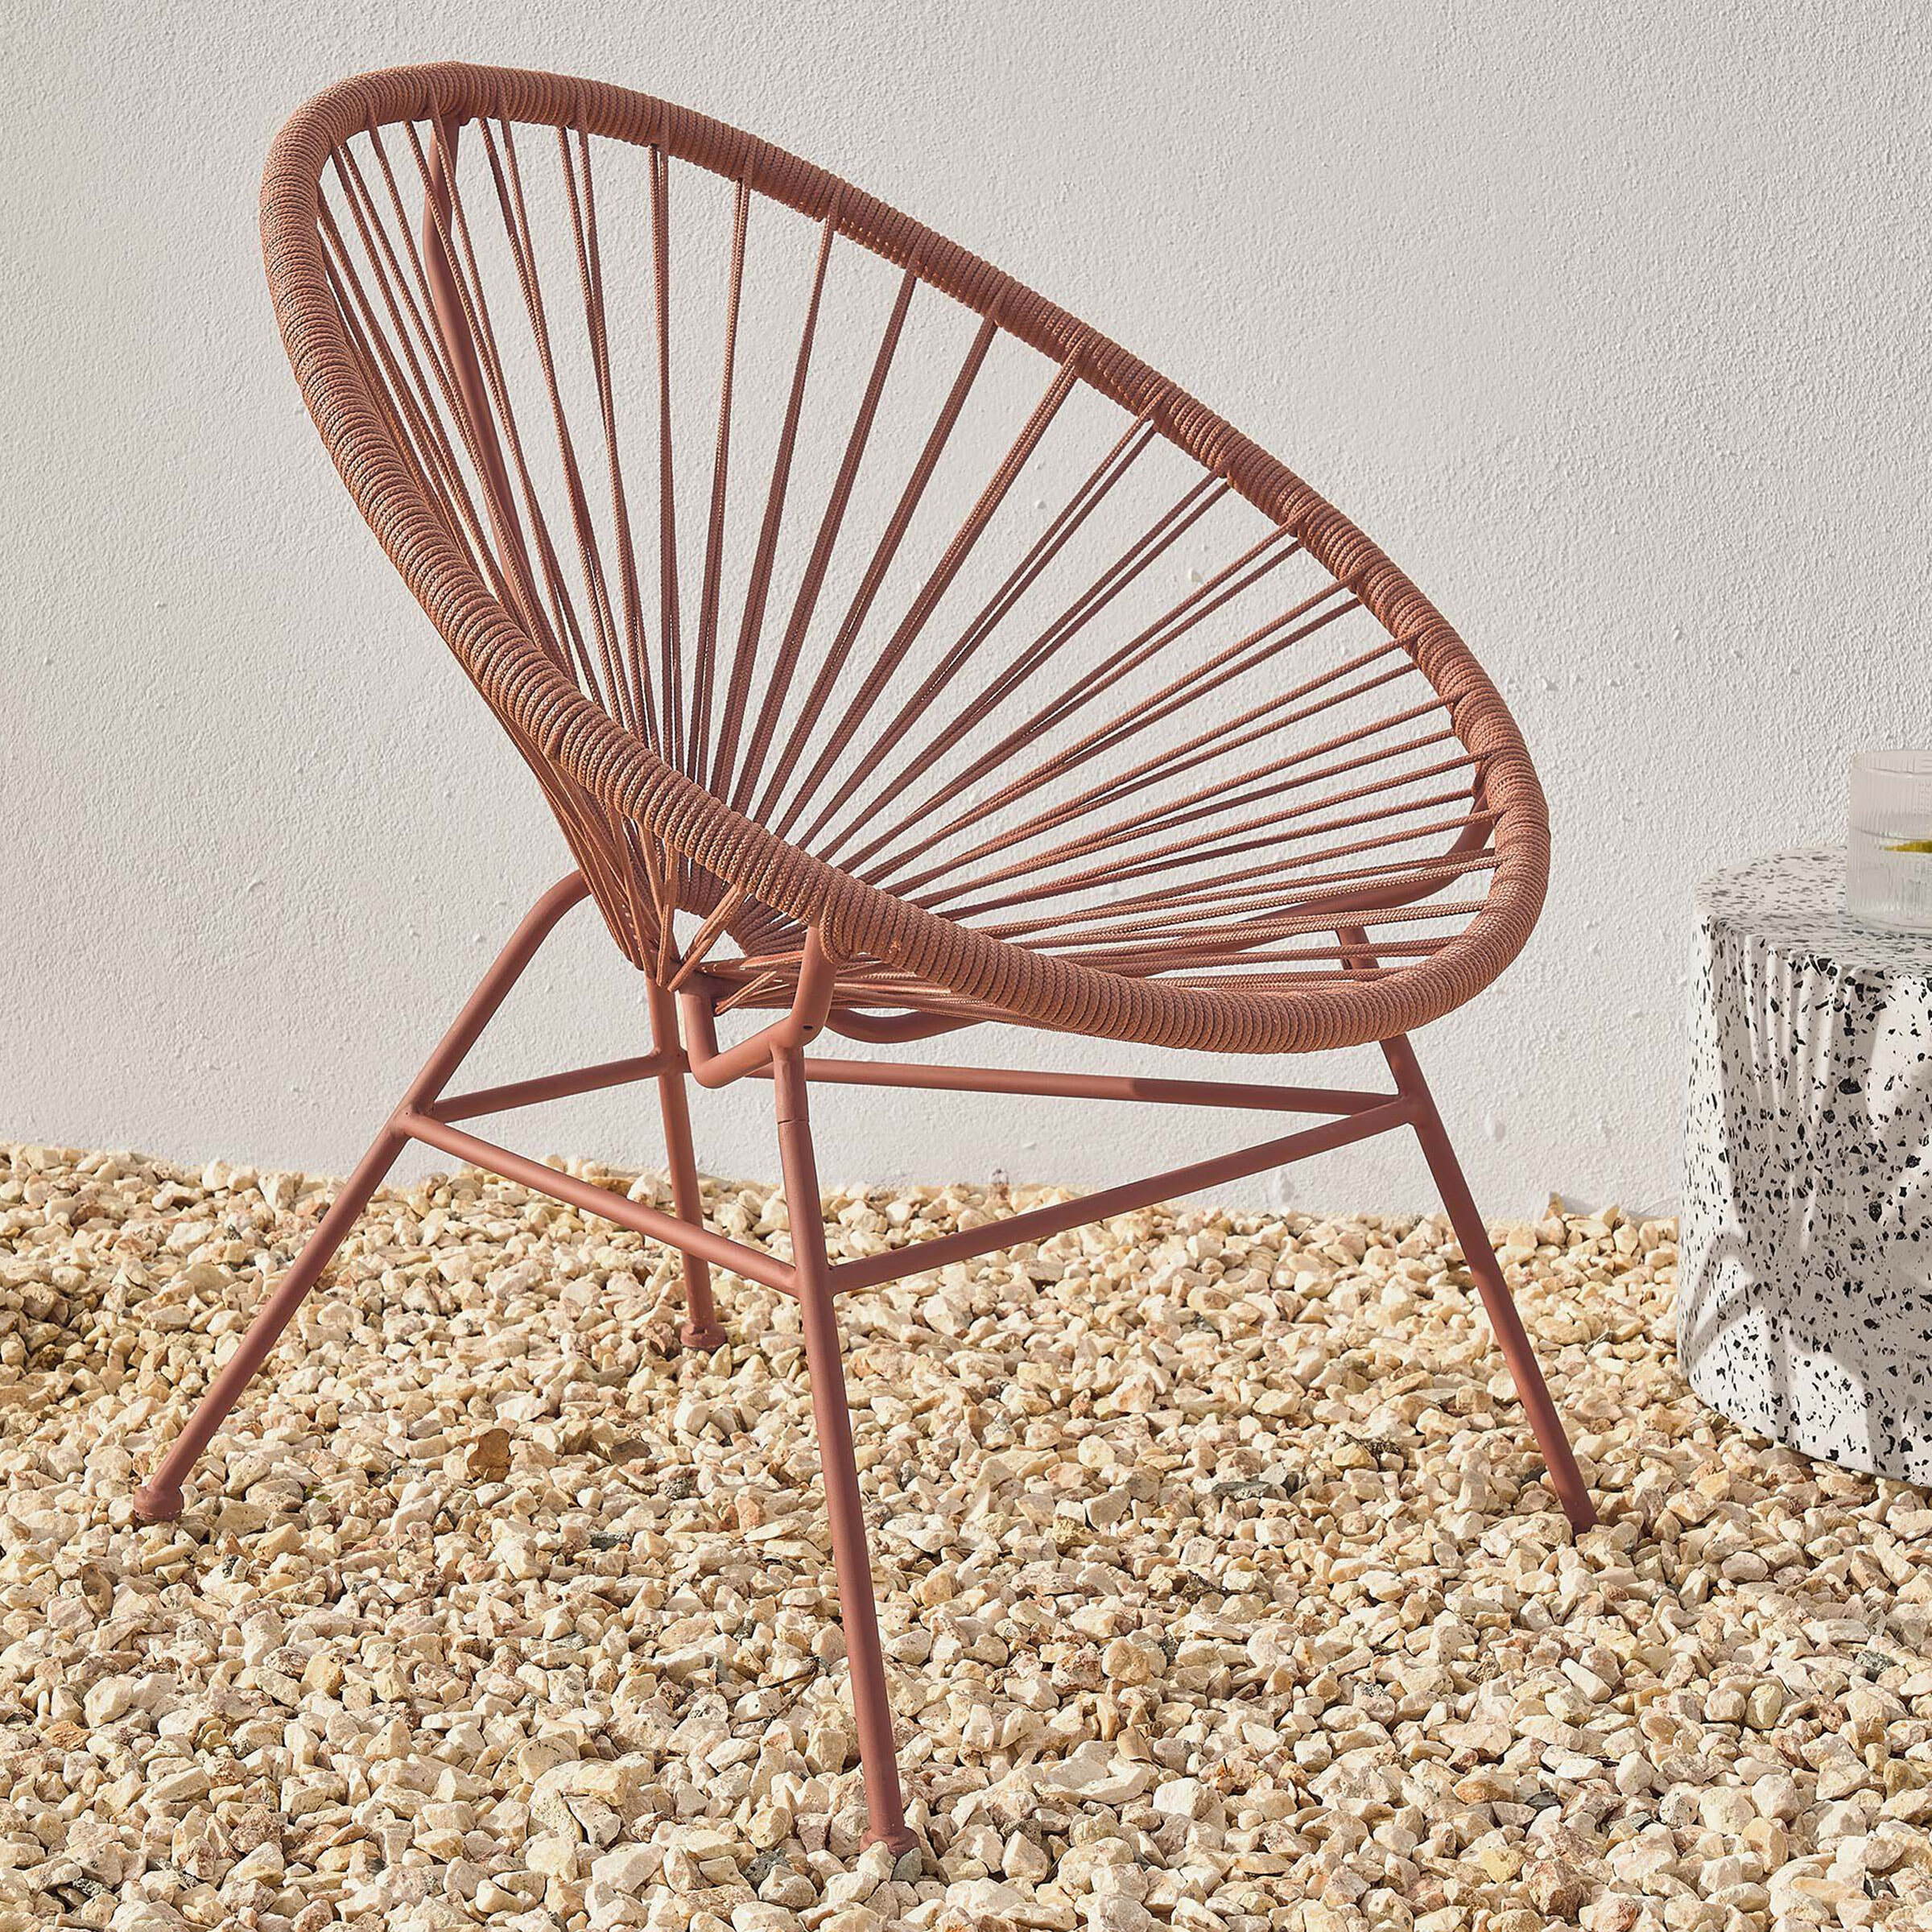 Kave Home Tuinstoel 'Samantha', kleur Bruin